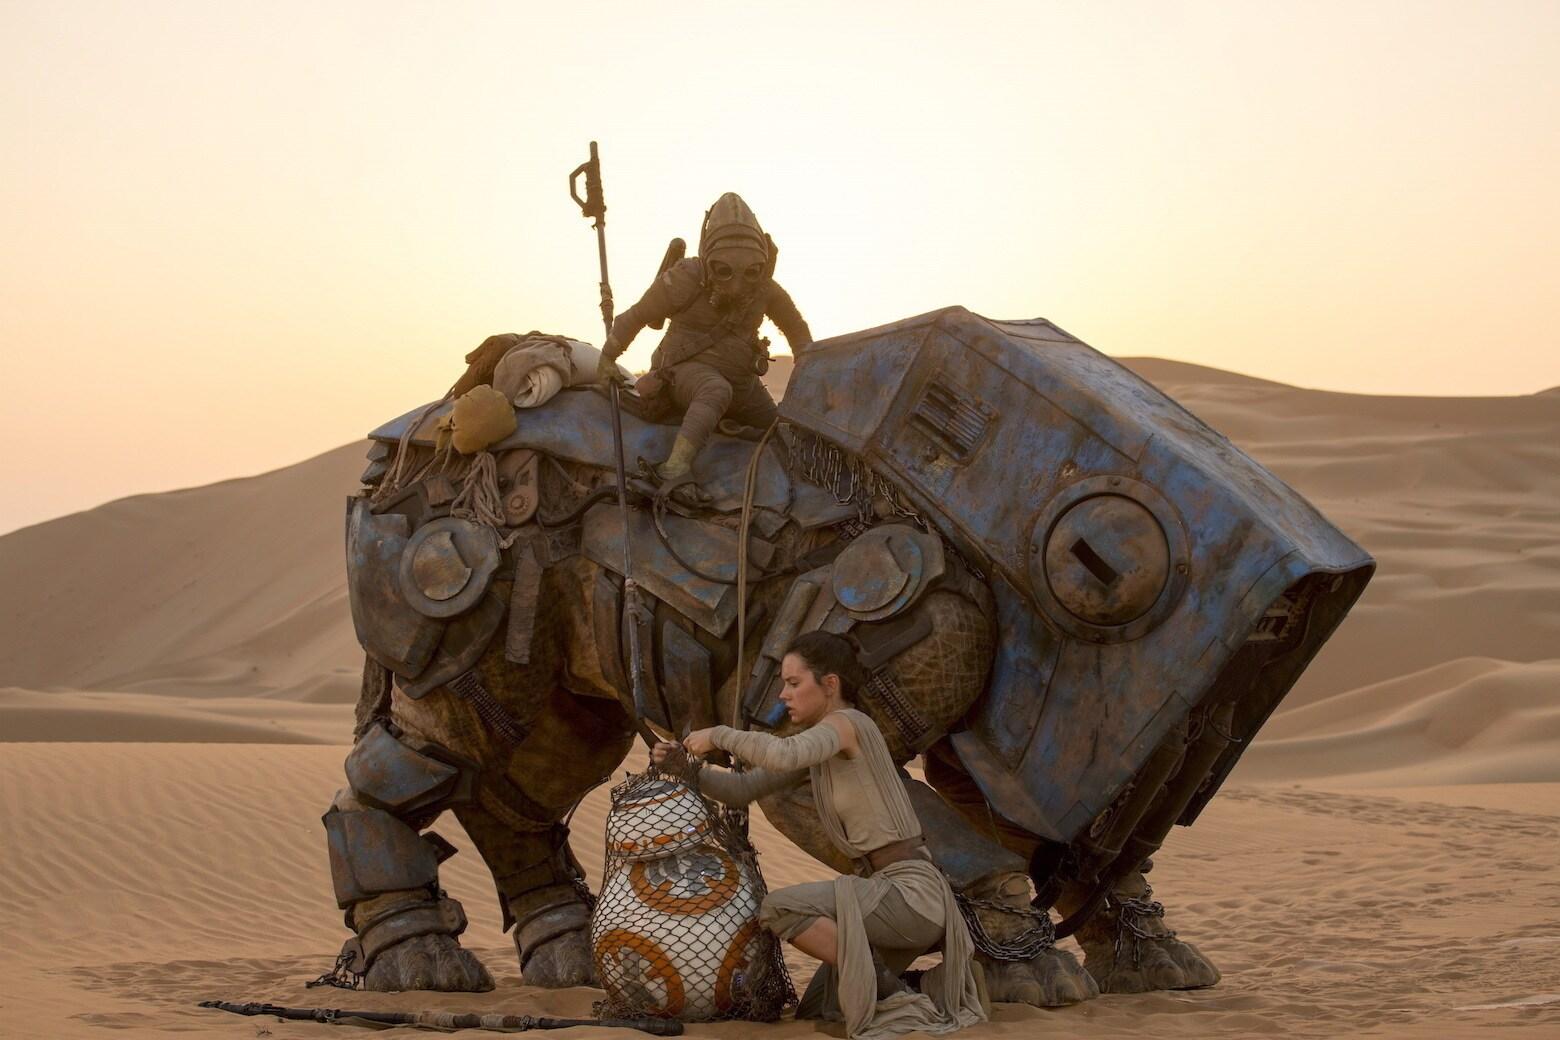 Rey readies BB-8 for transport